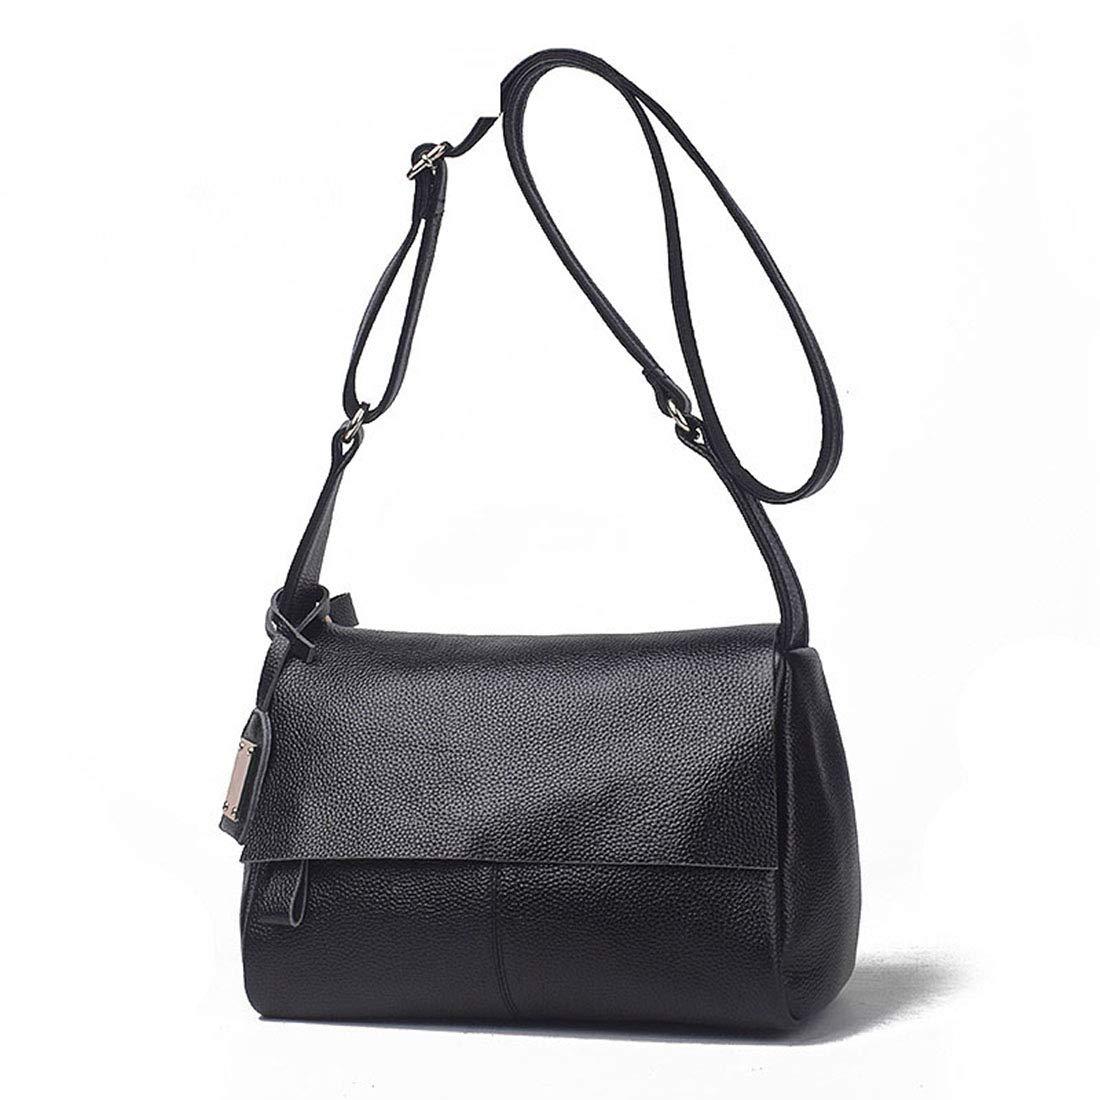 Honneury Bedruckte Lederhandtaschen Leder Diagonalpaket